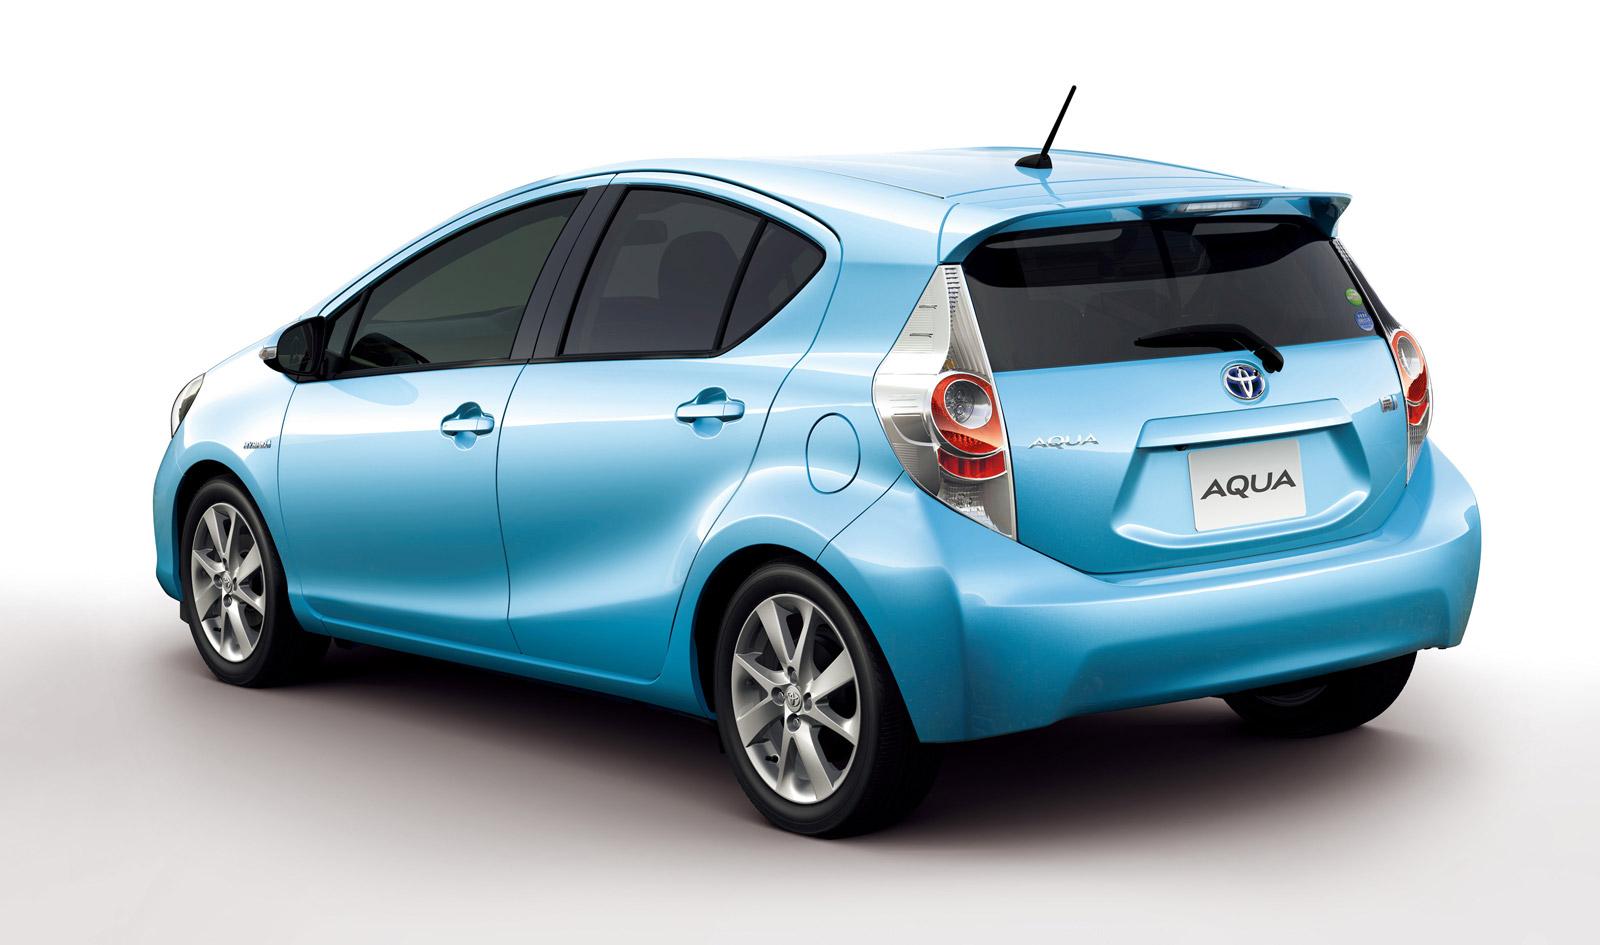 2012 Toyota Prius C Unveiled: Compact 52-MPG-Plus Hybrid Hatchback